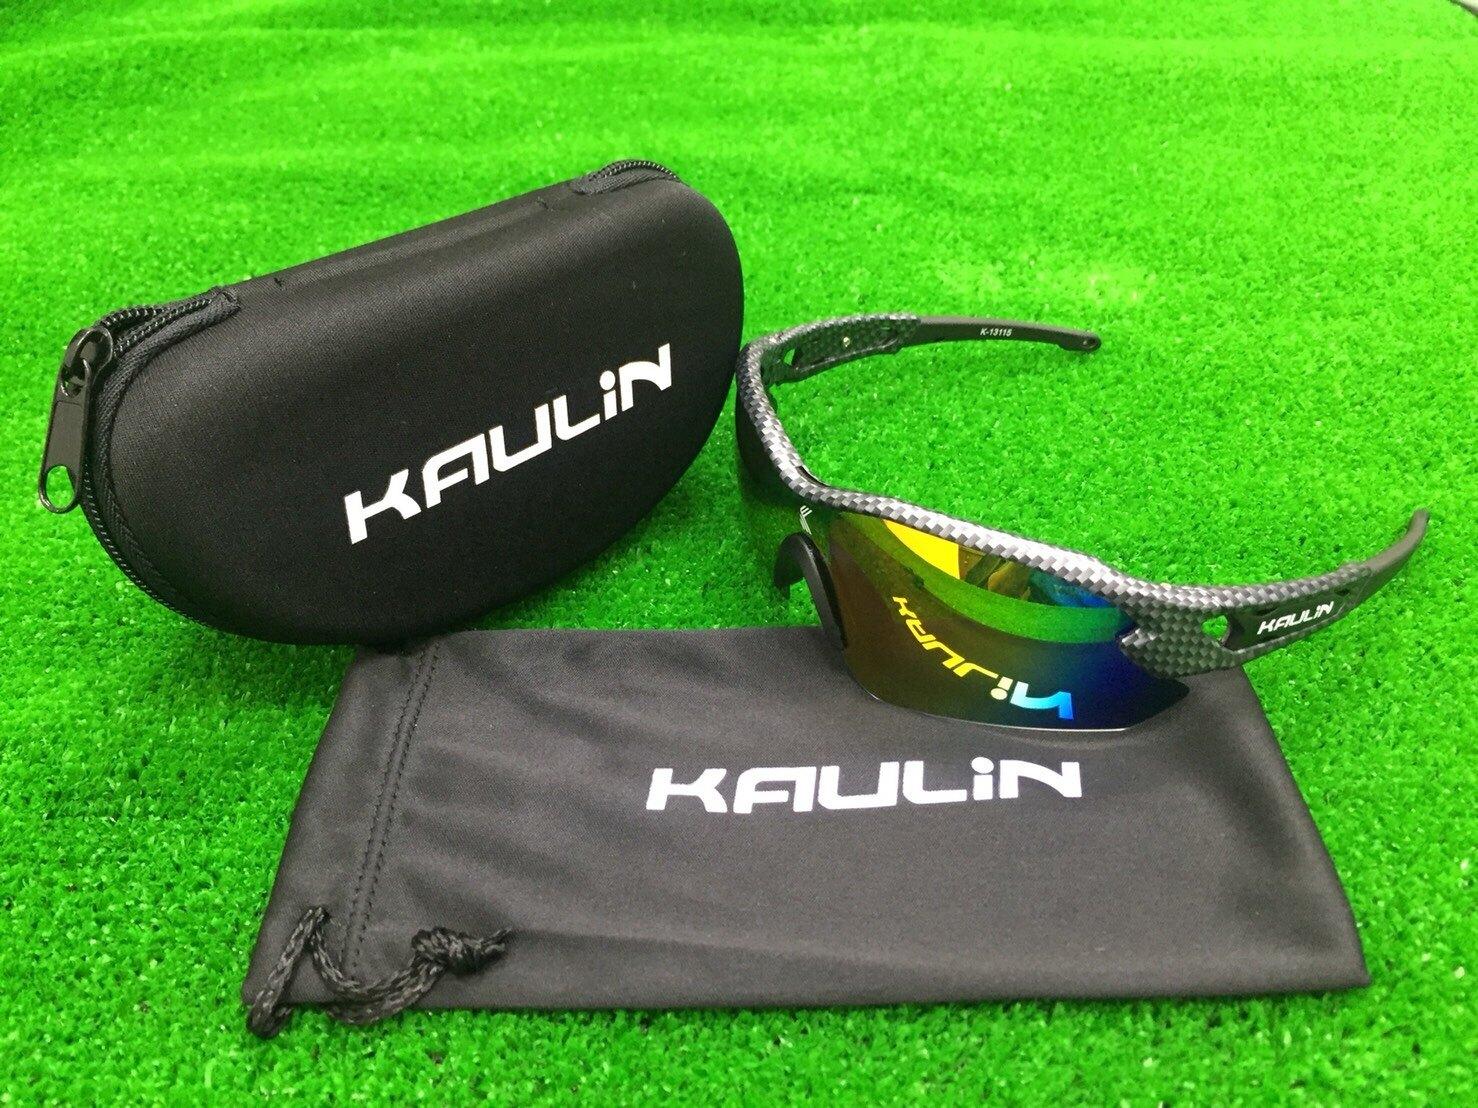 【H.Y SPORT】KAULIN 高林抗UV 400偏光運動太陽眼鏡 TR-90框/寶麗來偏光鏡片 三色